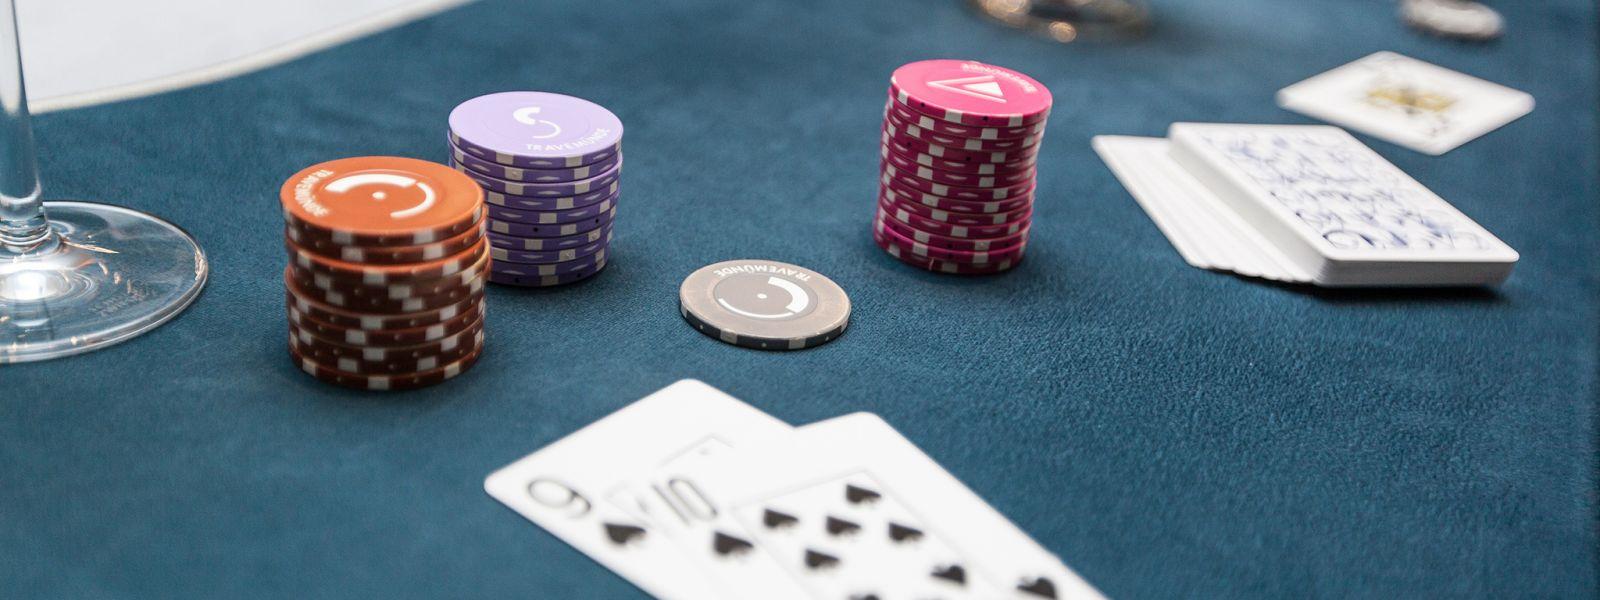 casino ohne einzahlung mobile